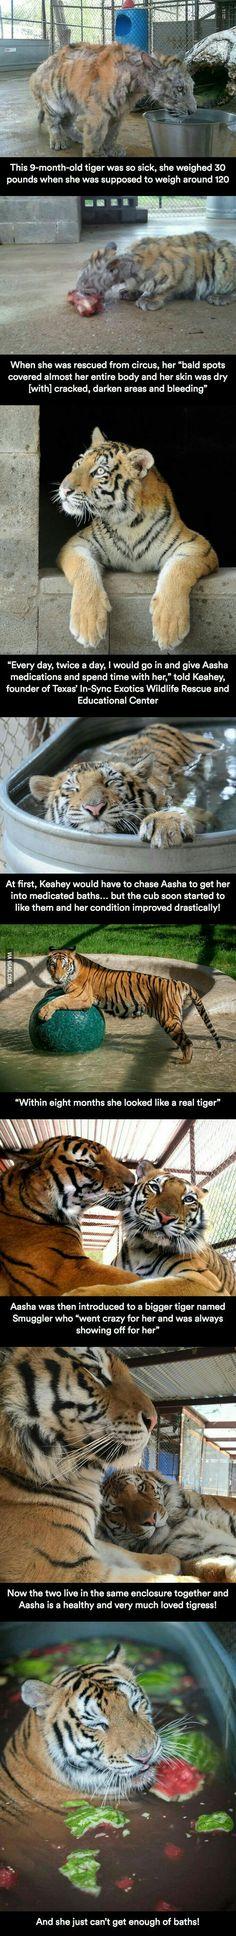 Aasha the cute Tiger